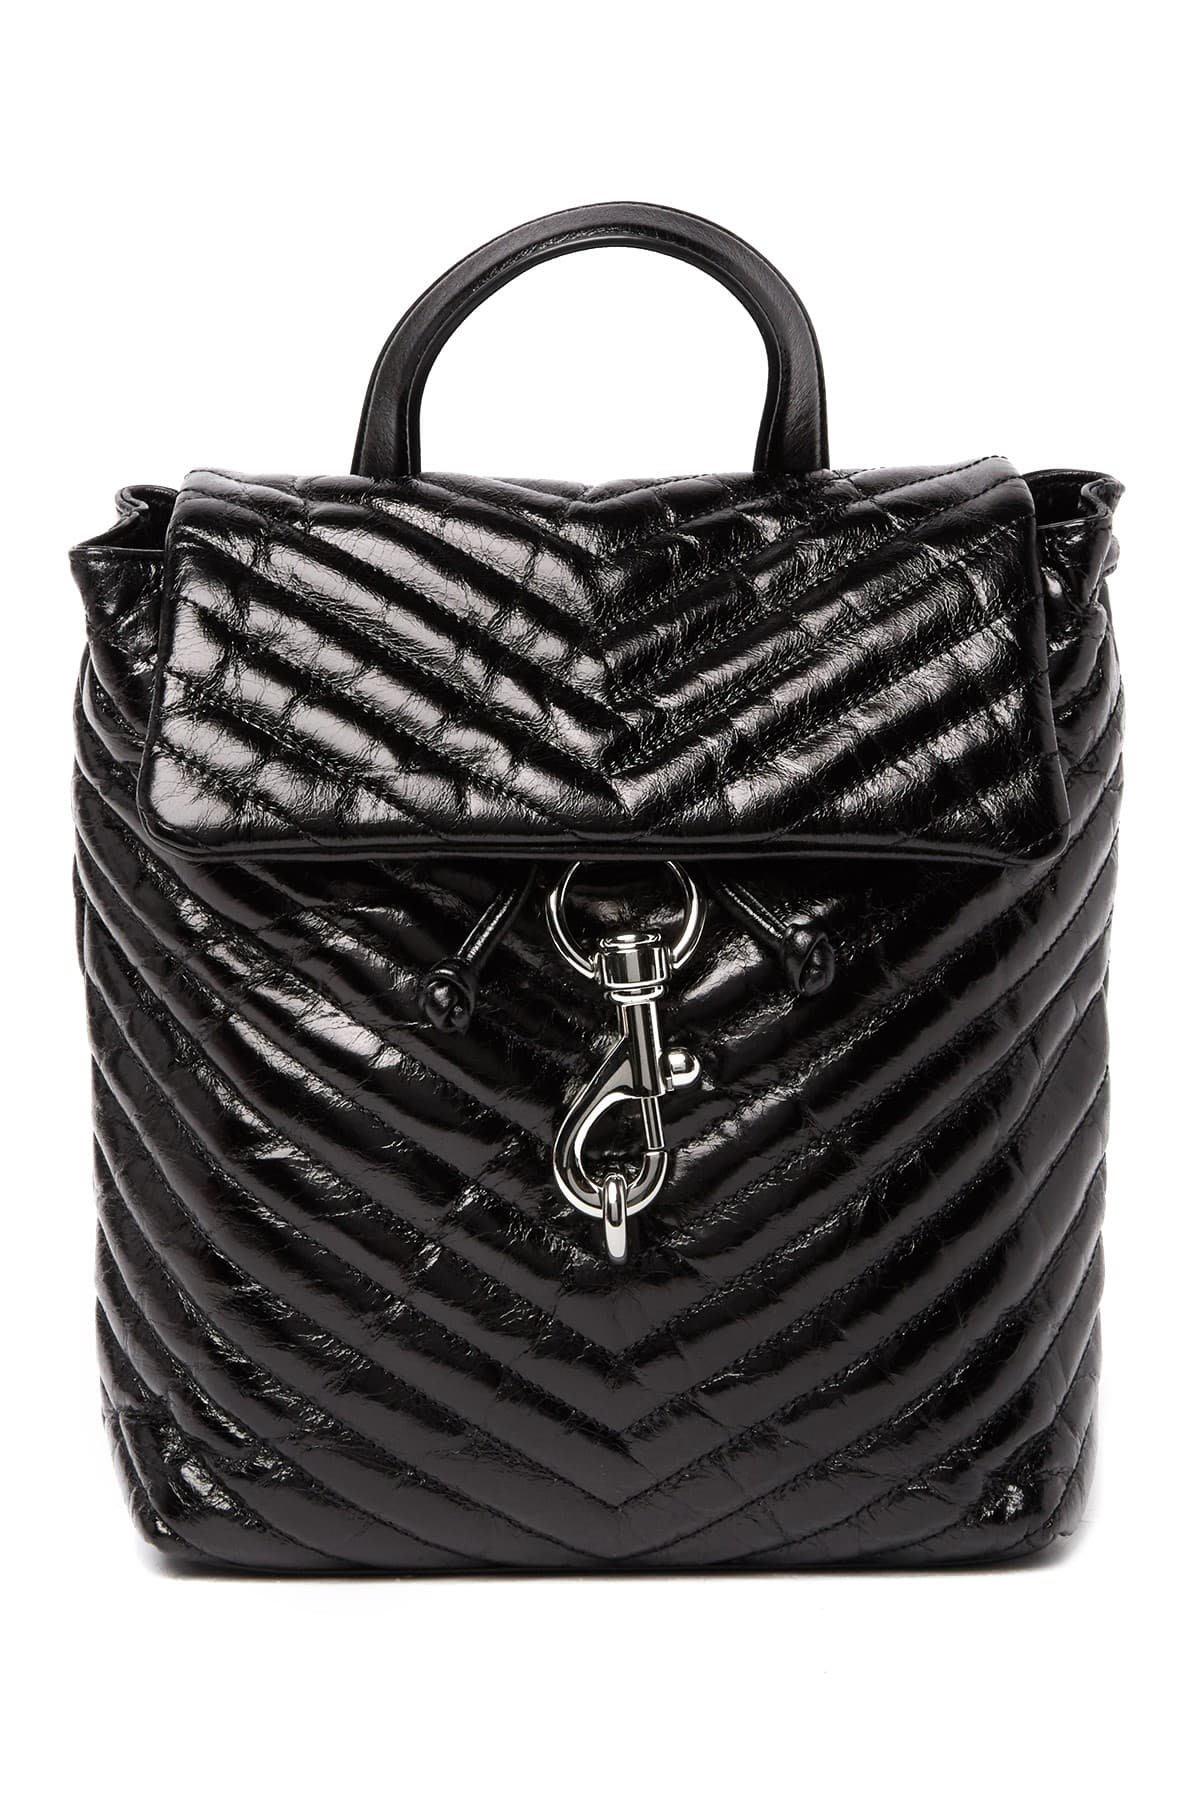 全新正品 Rebecca Minkoff Edie Quilted Leather Backpack 黑 後背包 油蠟皮